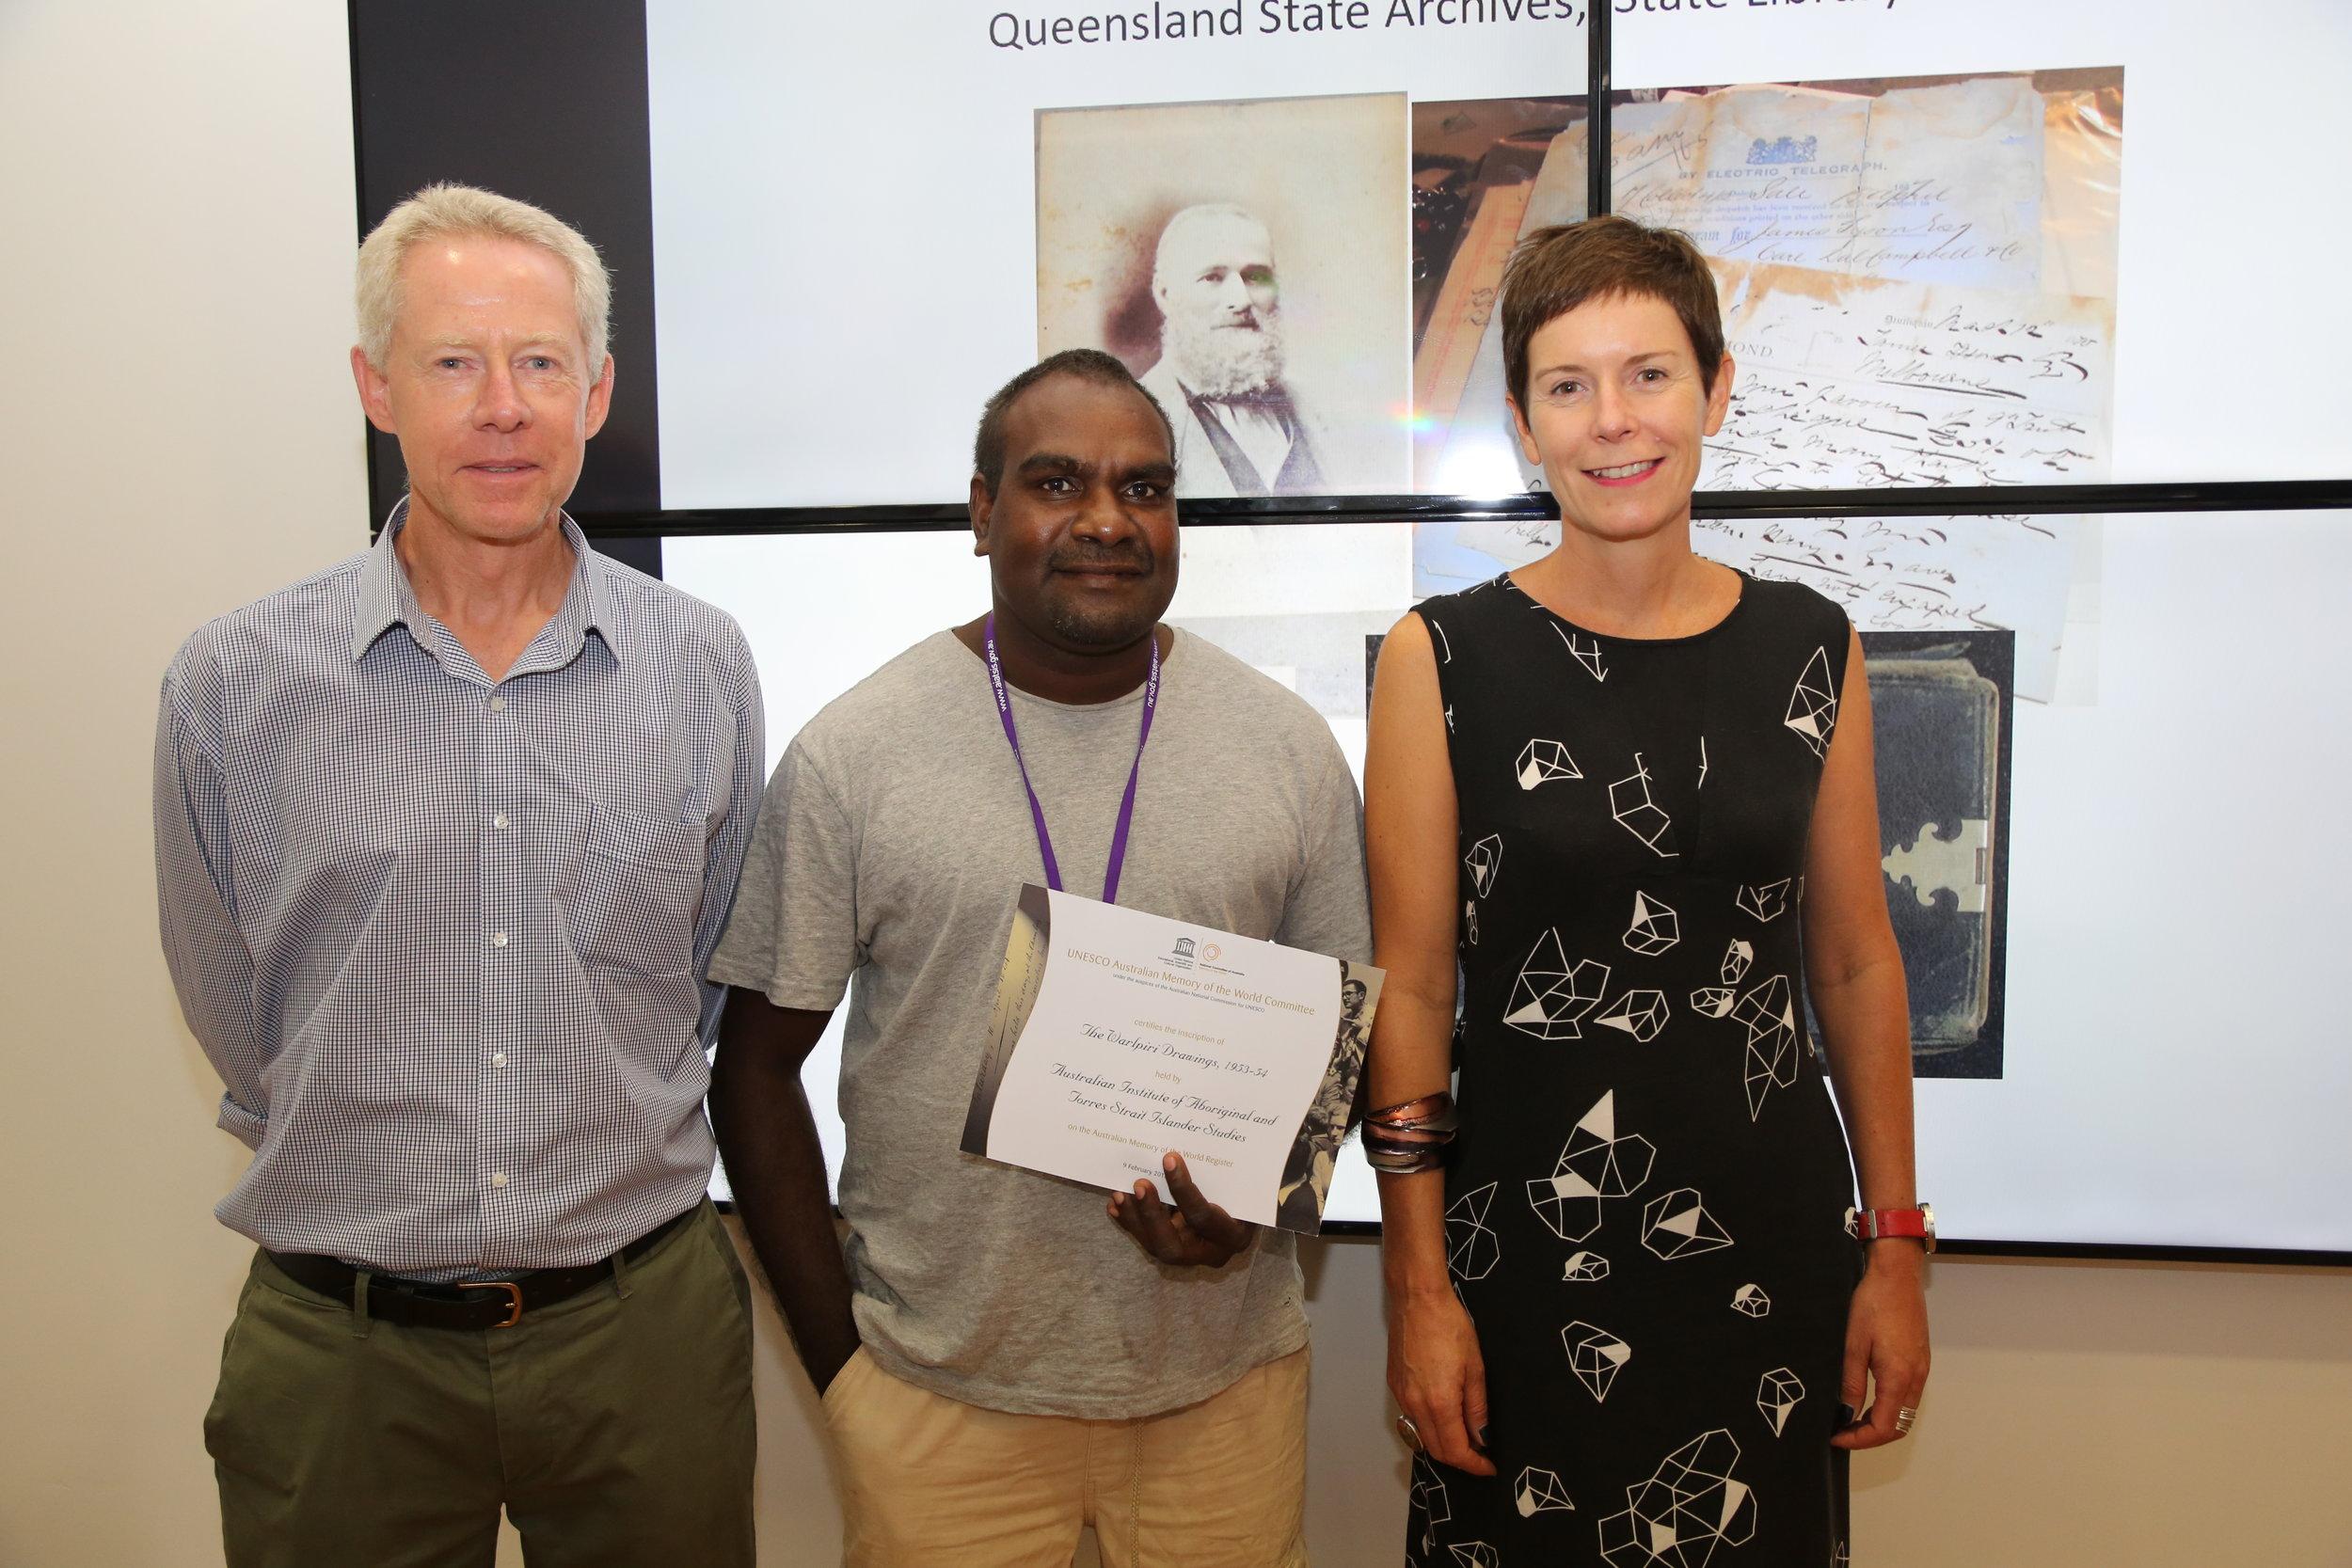 (L-R) David Jeffery, Gerald Japanangka Watson, Melinda Hinkson: Warlpiri drawings added to the UNESCO Memory of the World Register, Canberra, February 2017.